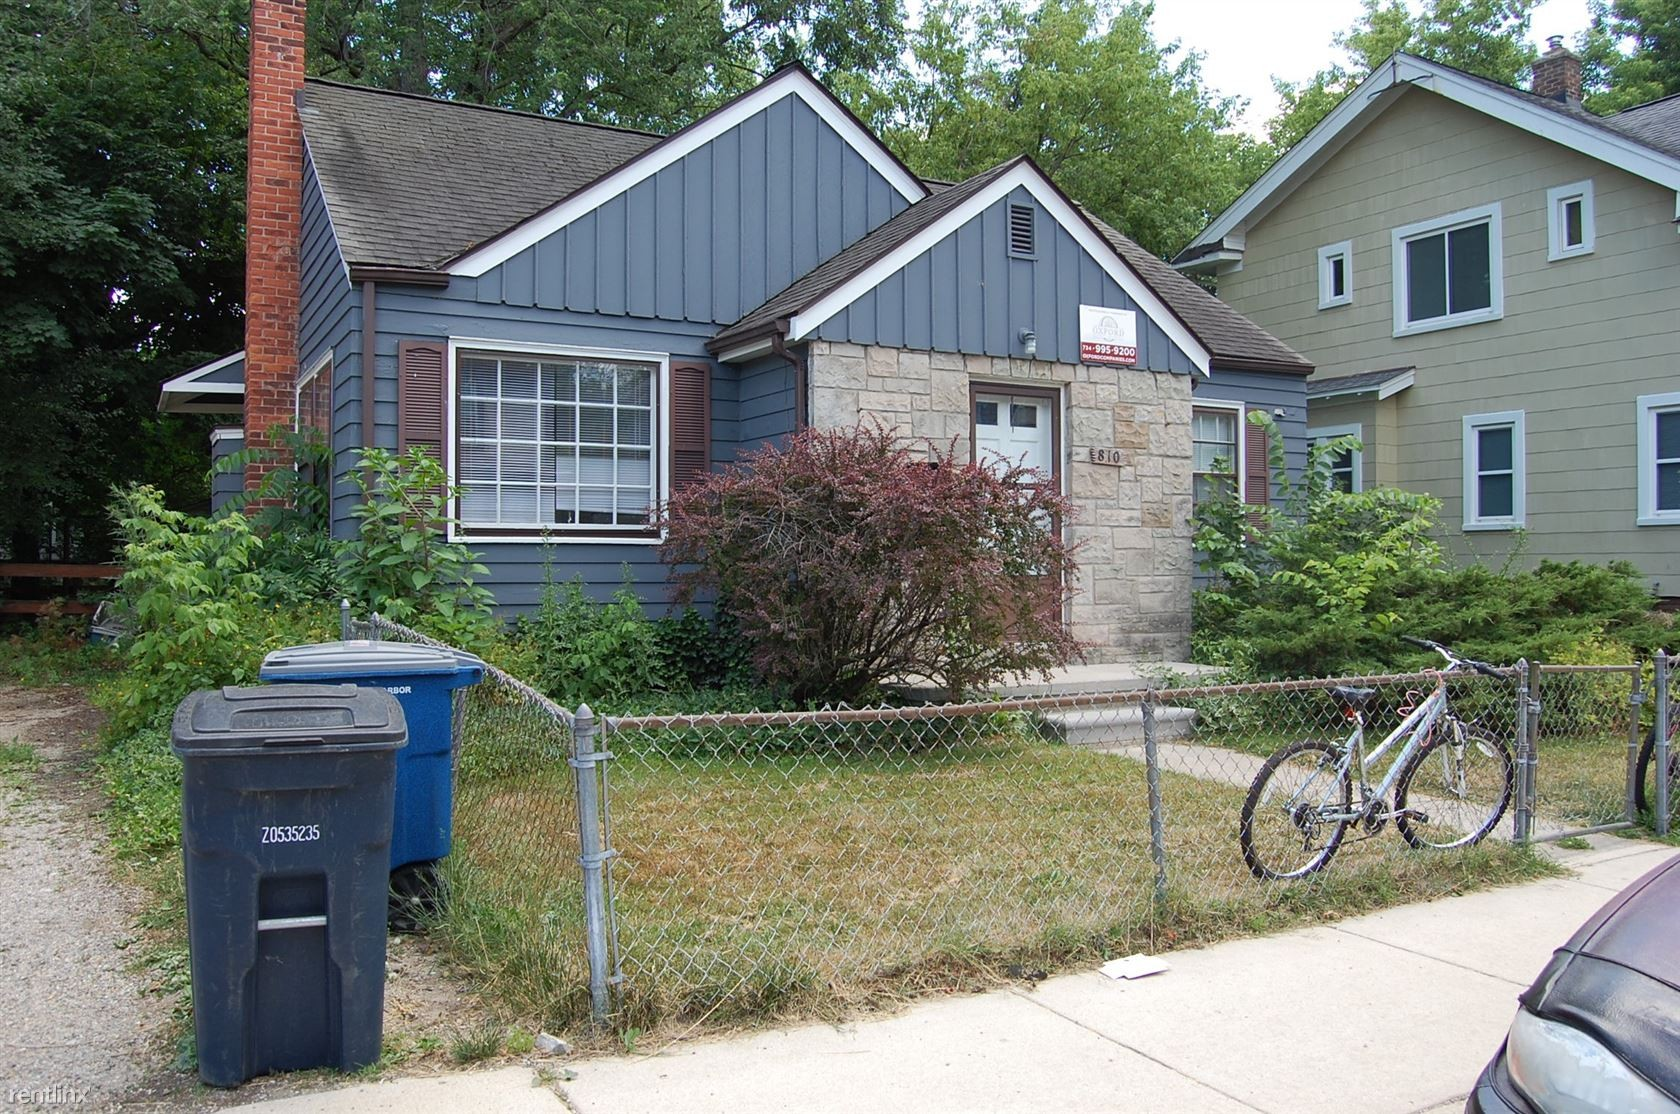 810 Sylvan Ave Ann Arbor Mi 48104 3 Bedroom Apartment